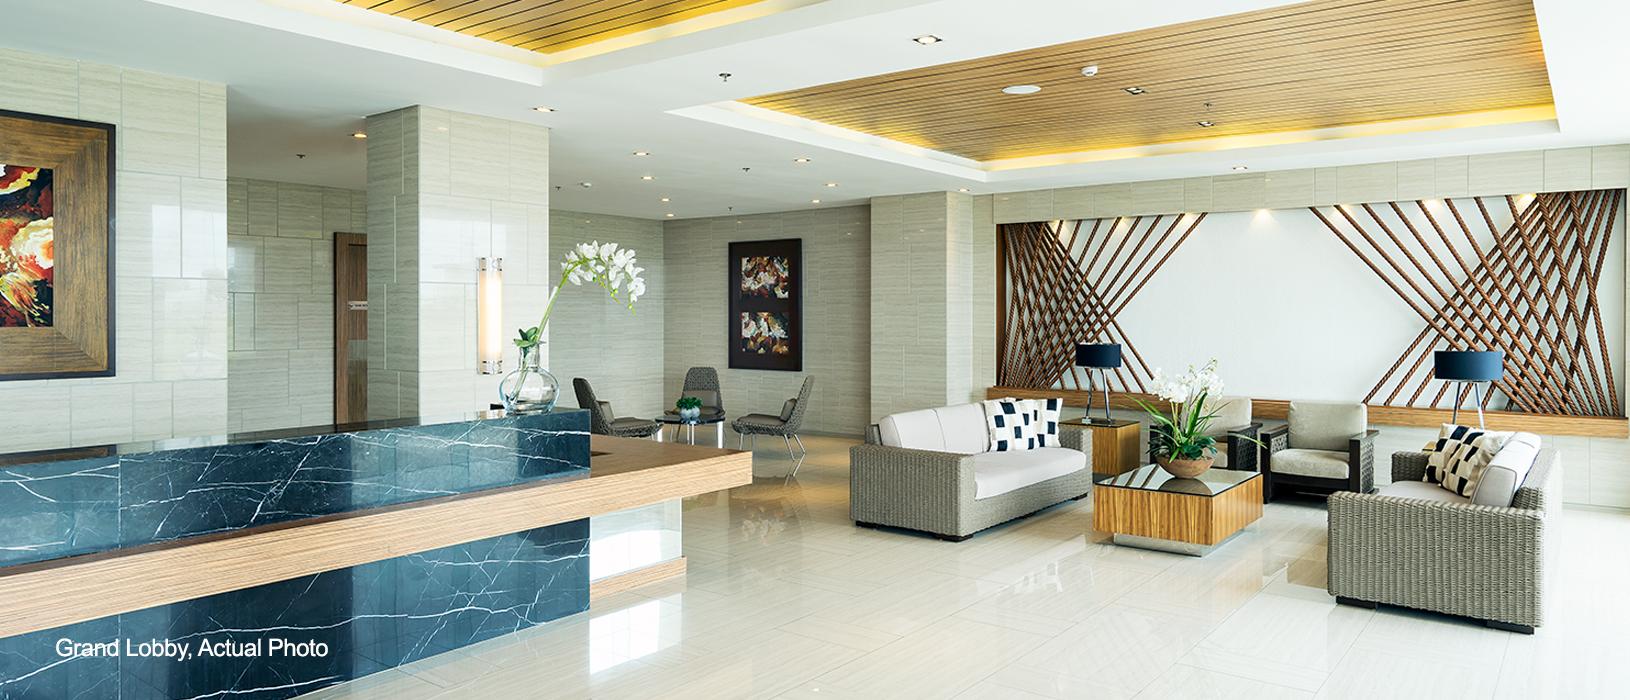 Wind Residences Grand lobby 3